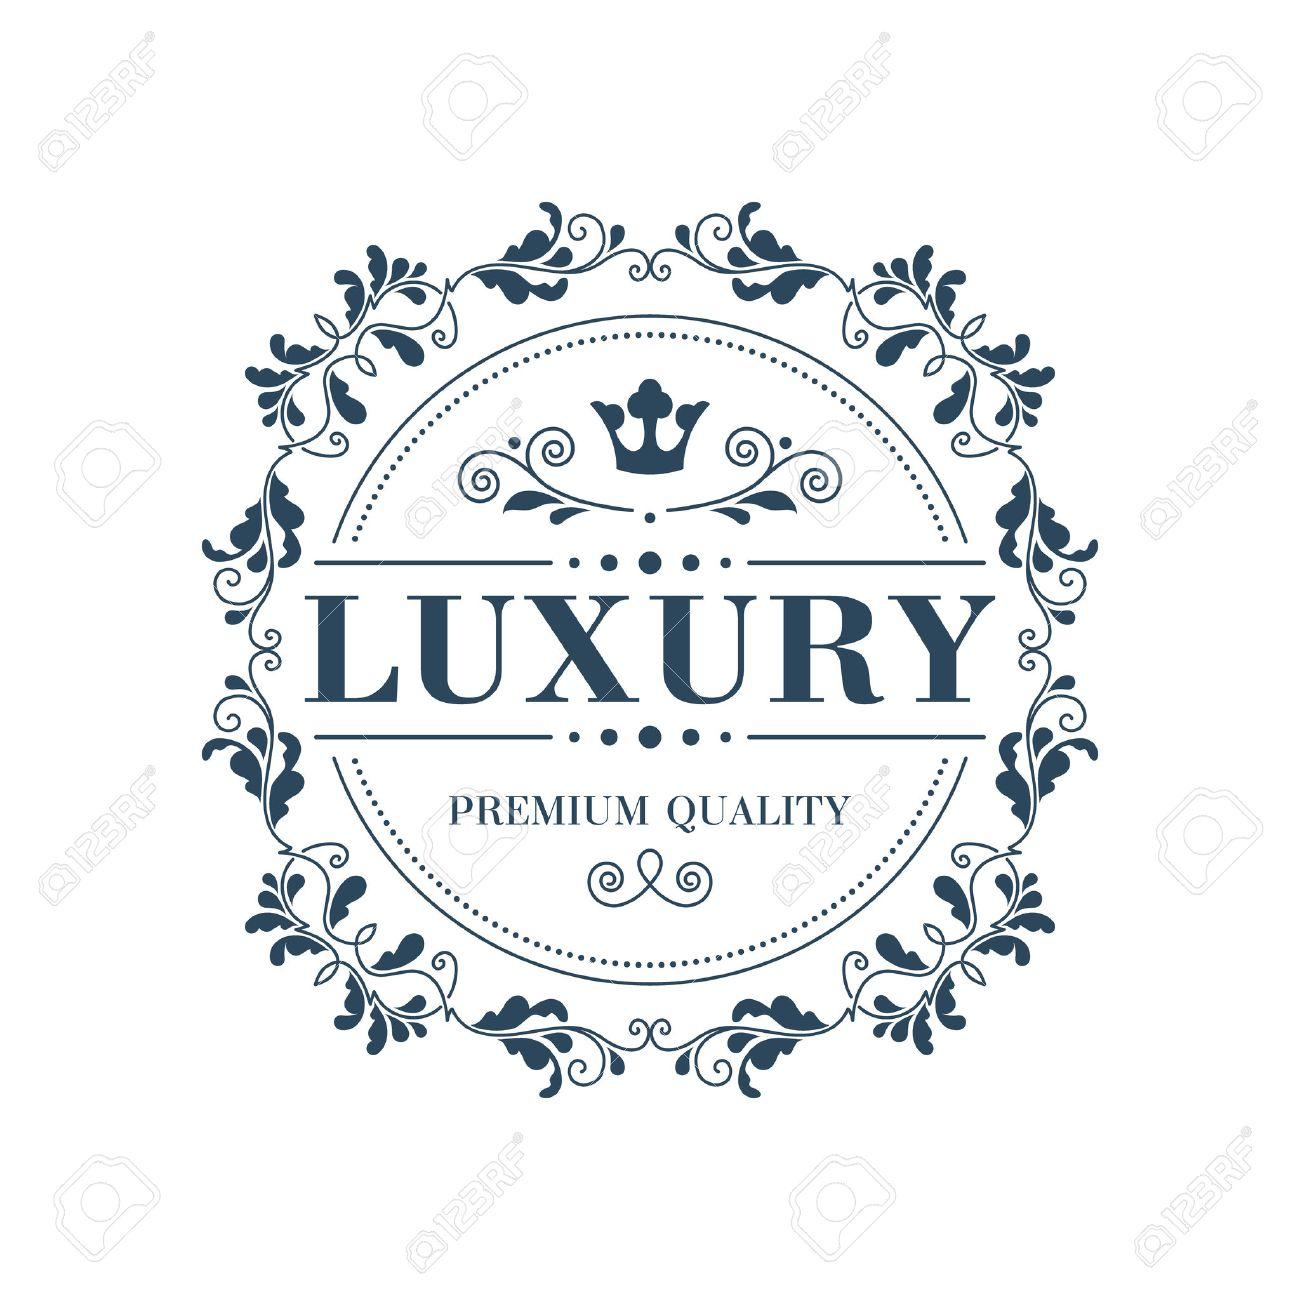 Flourish logo template glamour calligraphic monogram ornament label. Good for restaurant boutique hotel heraldic jewelry fashion emblem. Vector illustration. - 44756685